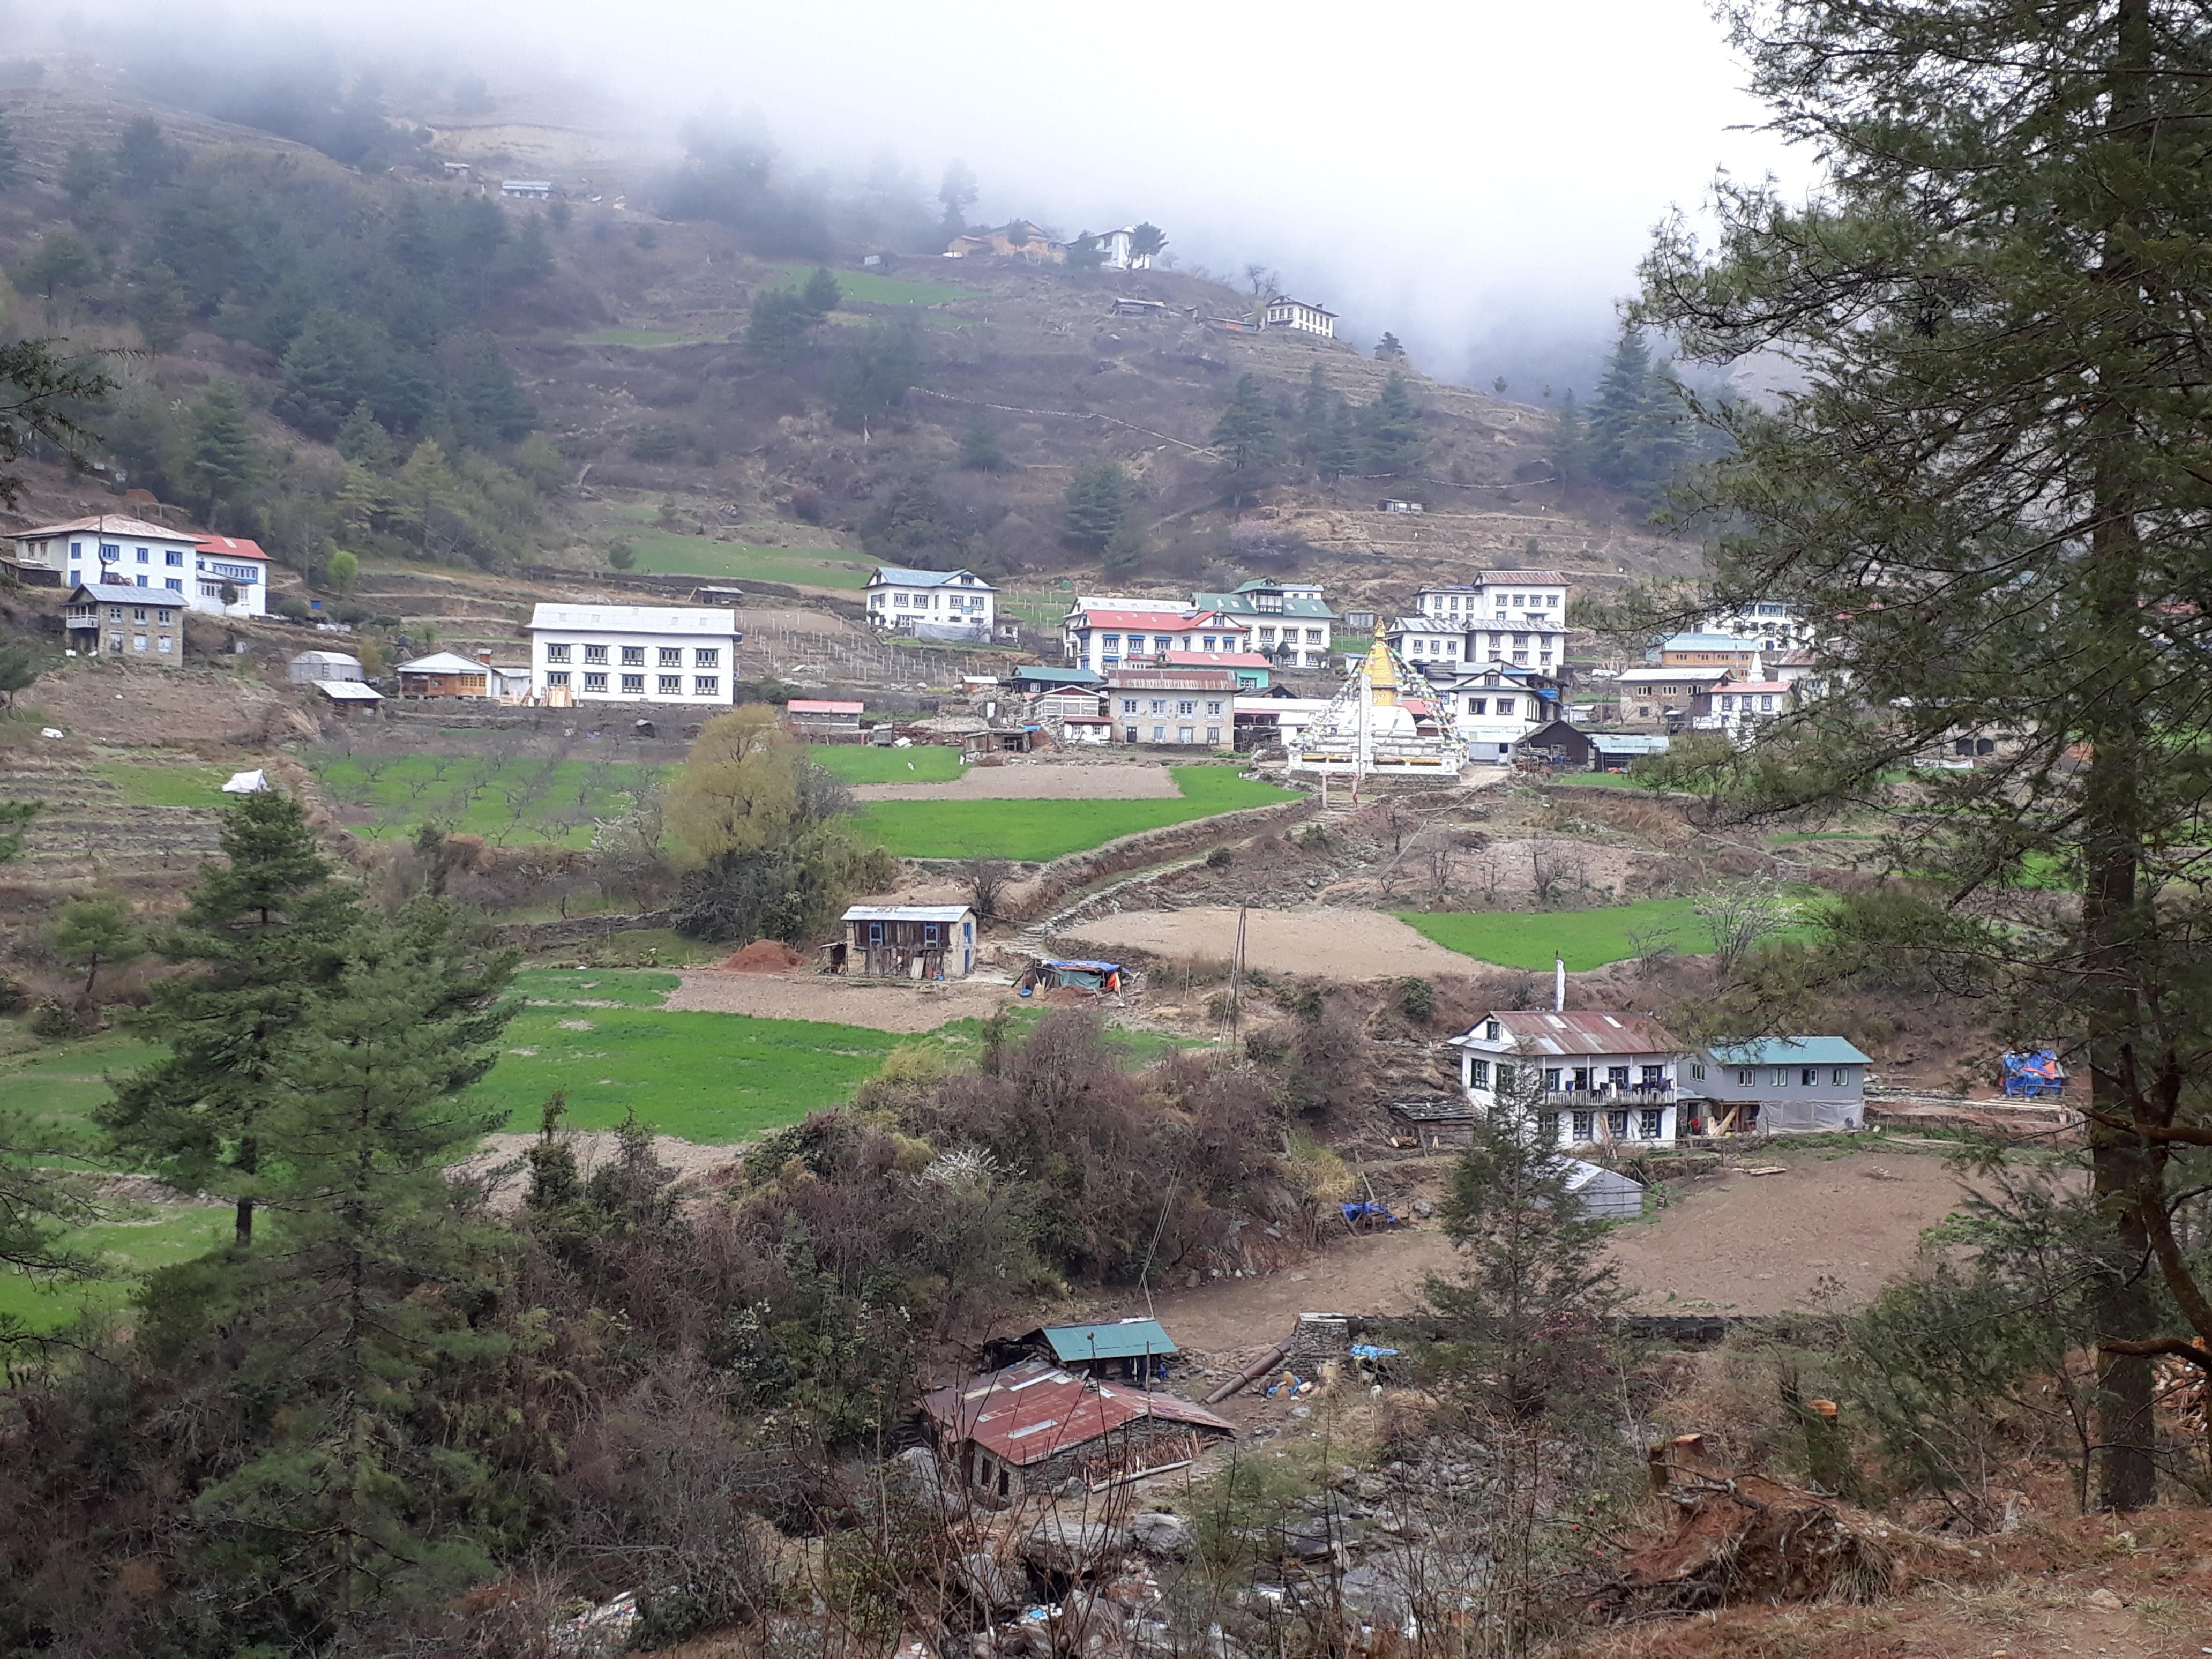 Everest Base Camp Trek - A Himalayan Village